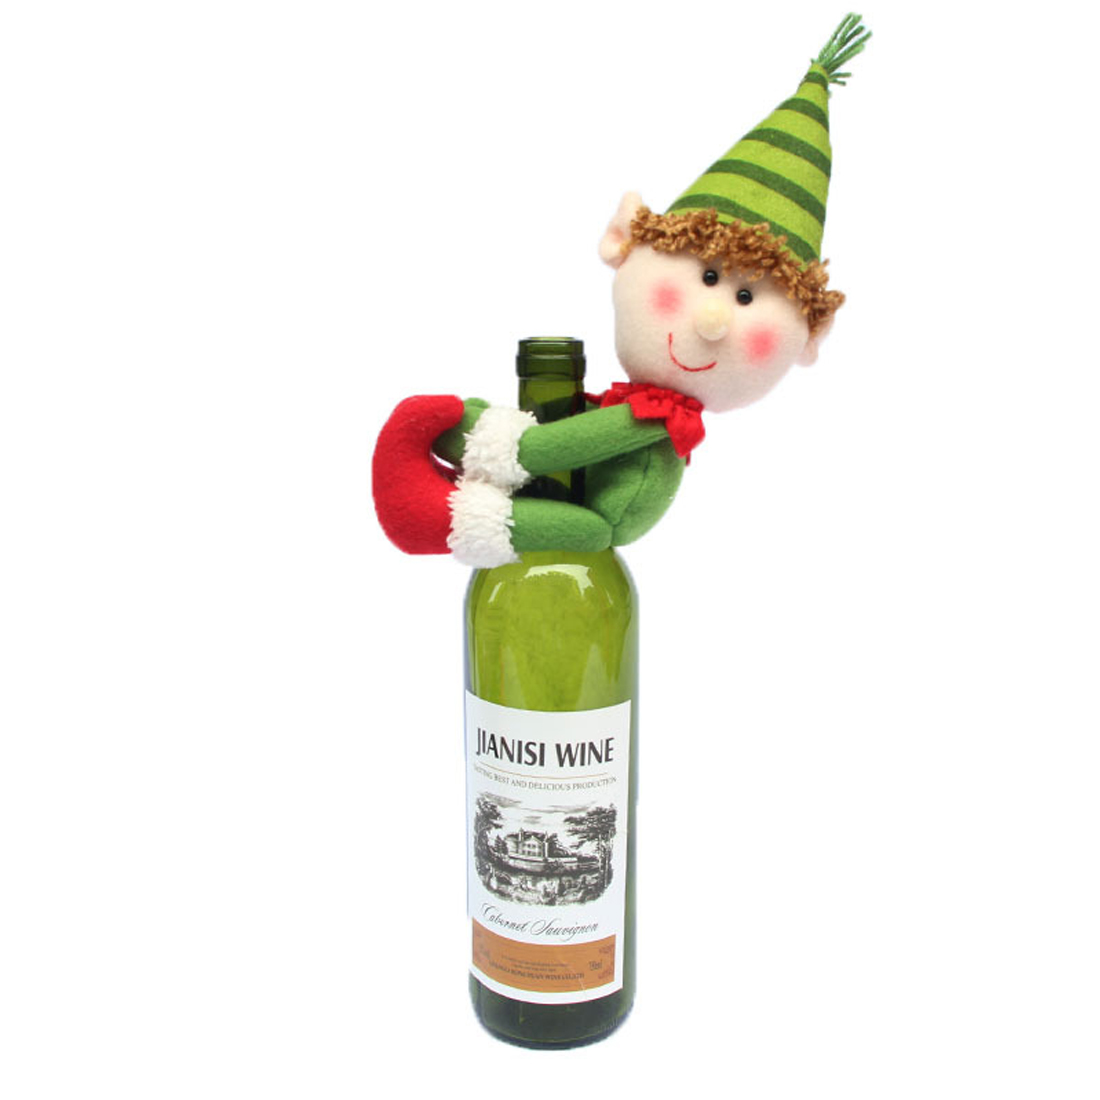 Home Santa Claus Wine Bottle Cover Christmas Decorations For Home Snowman Bottle Pendant Sets Xmas Dinner Table Decor